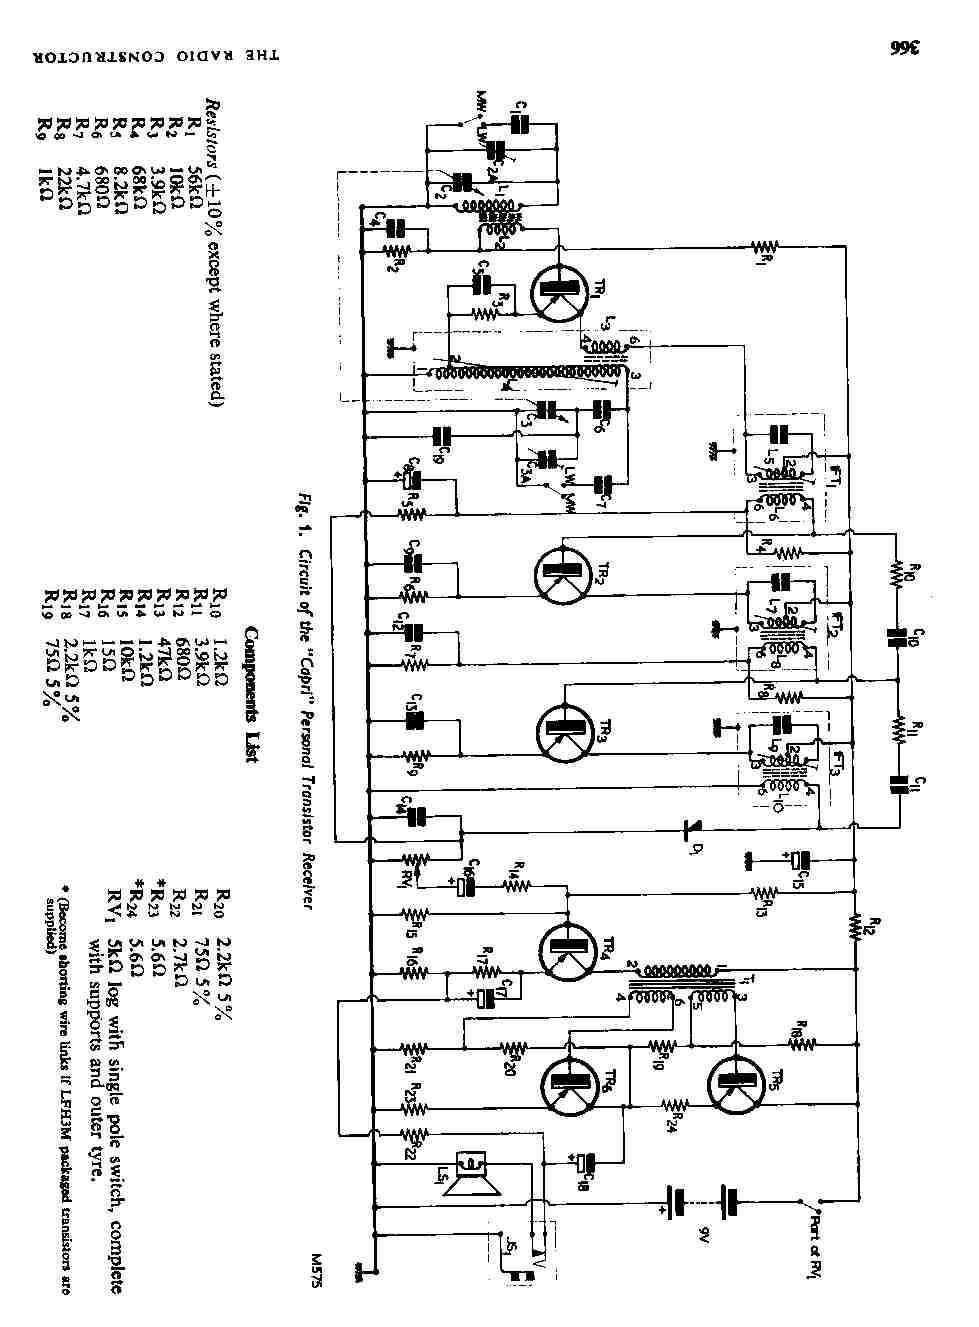 Vintage Radio and Electronics. Capri 6 Transistor Portable